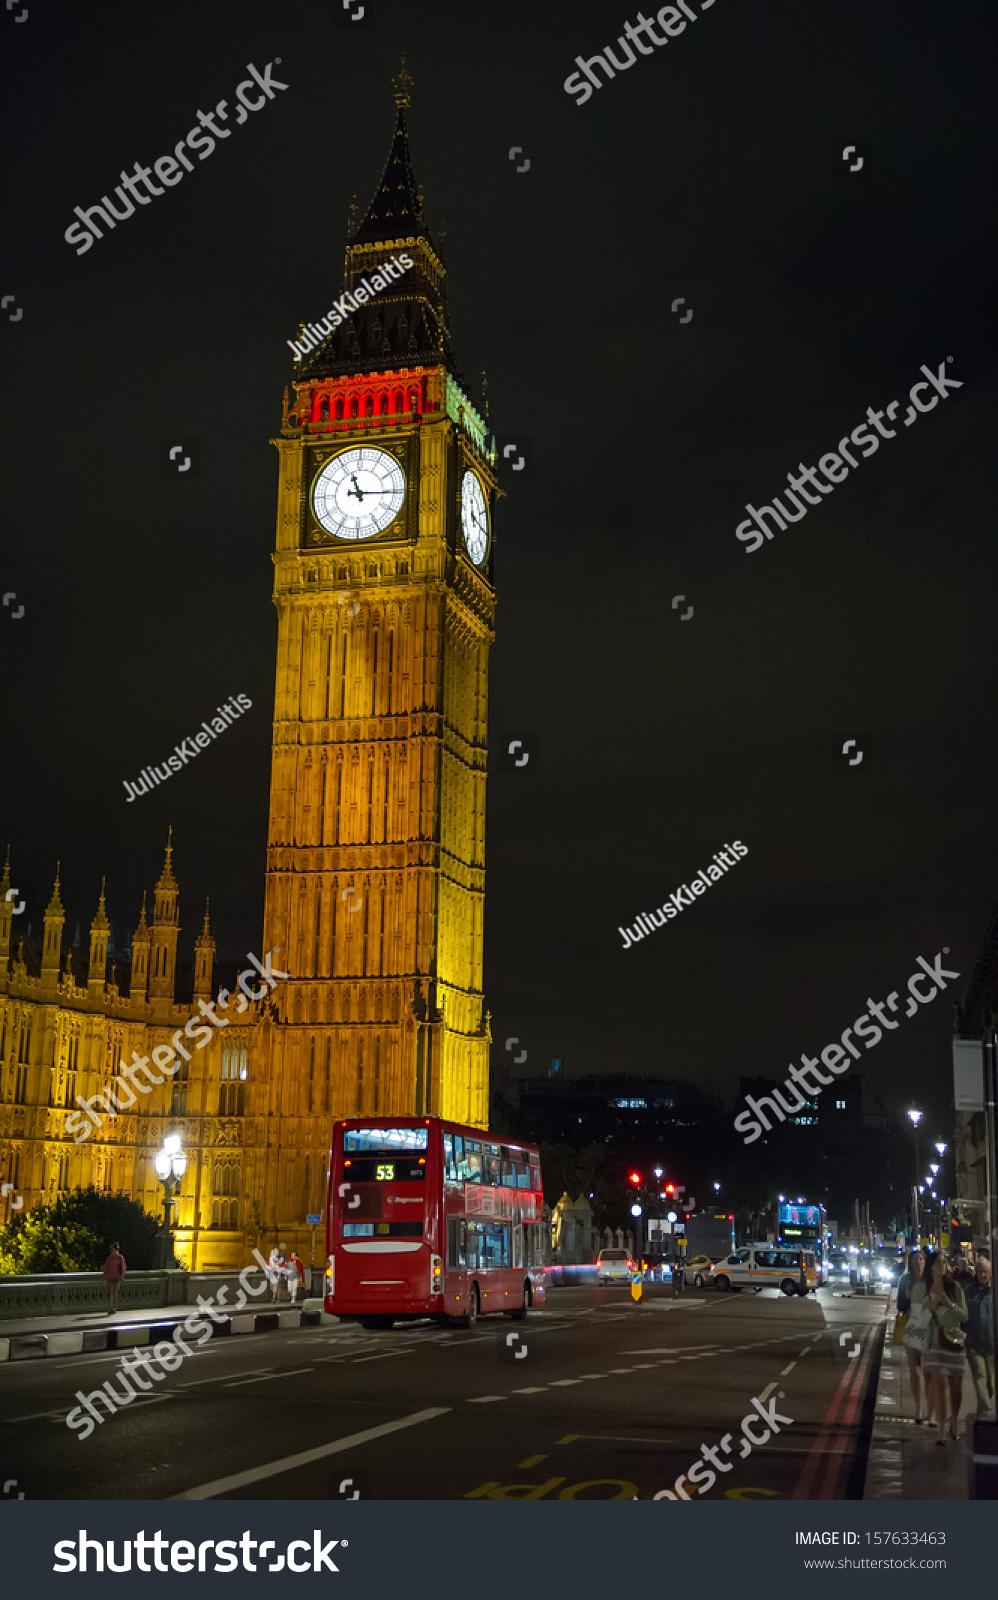 London may 21 big ben house stock photo 157633463 shutterstock london may 21 big ben and house of parliament at night on may 21 biocorpaavc